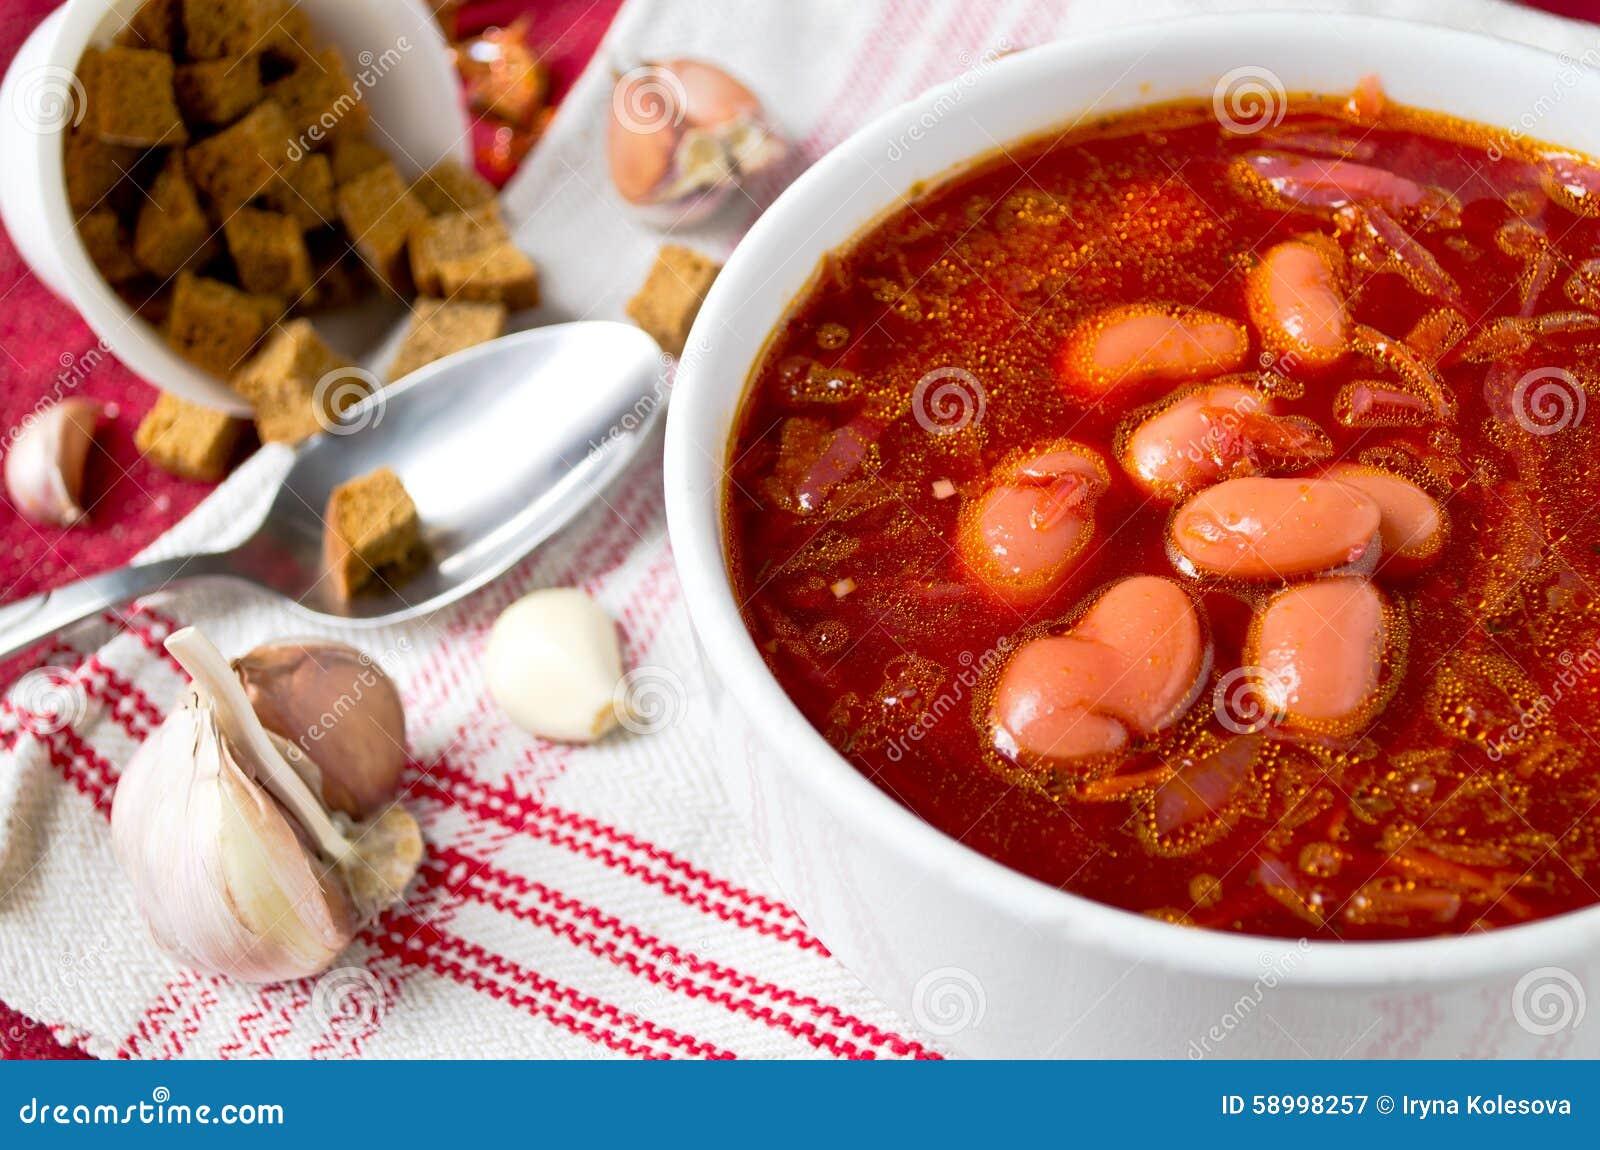 Ukrainian Red Borscht Soup Recipe — Dishmaps